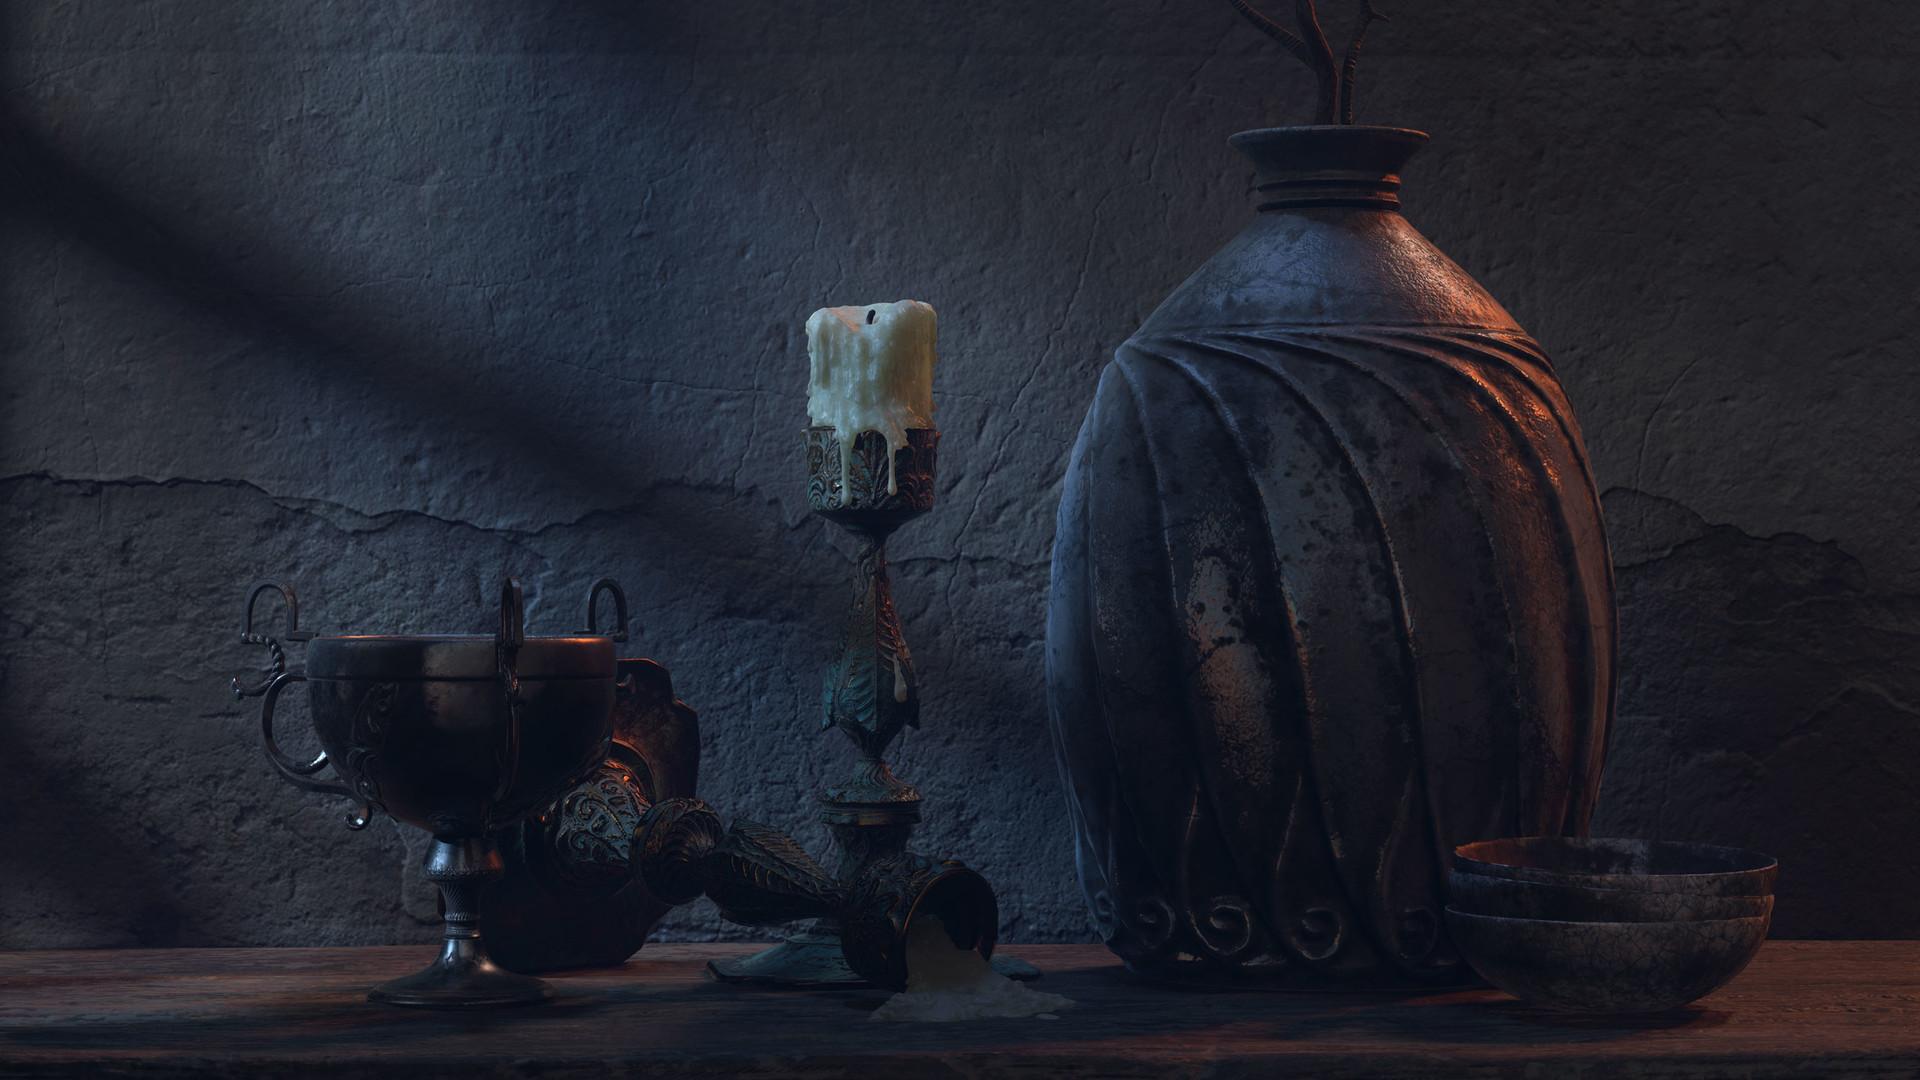 Pablo munoz gomez pottery scene dark blue